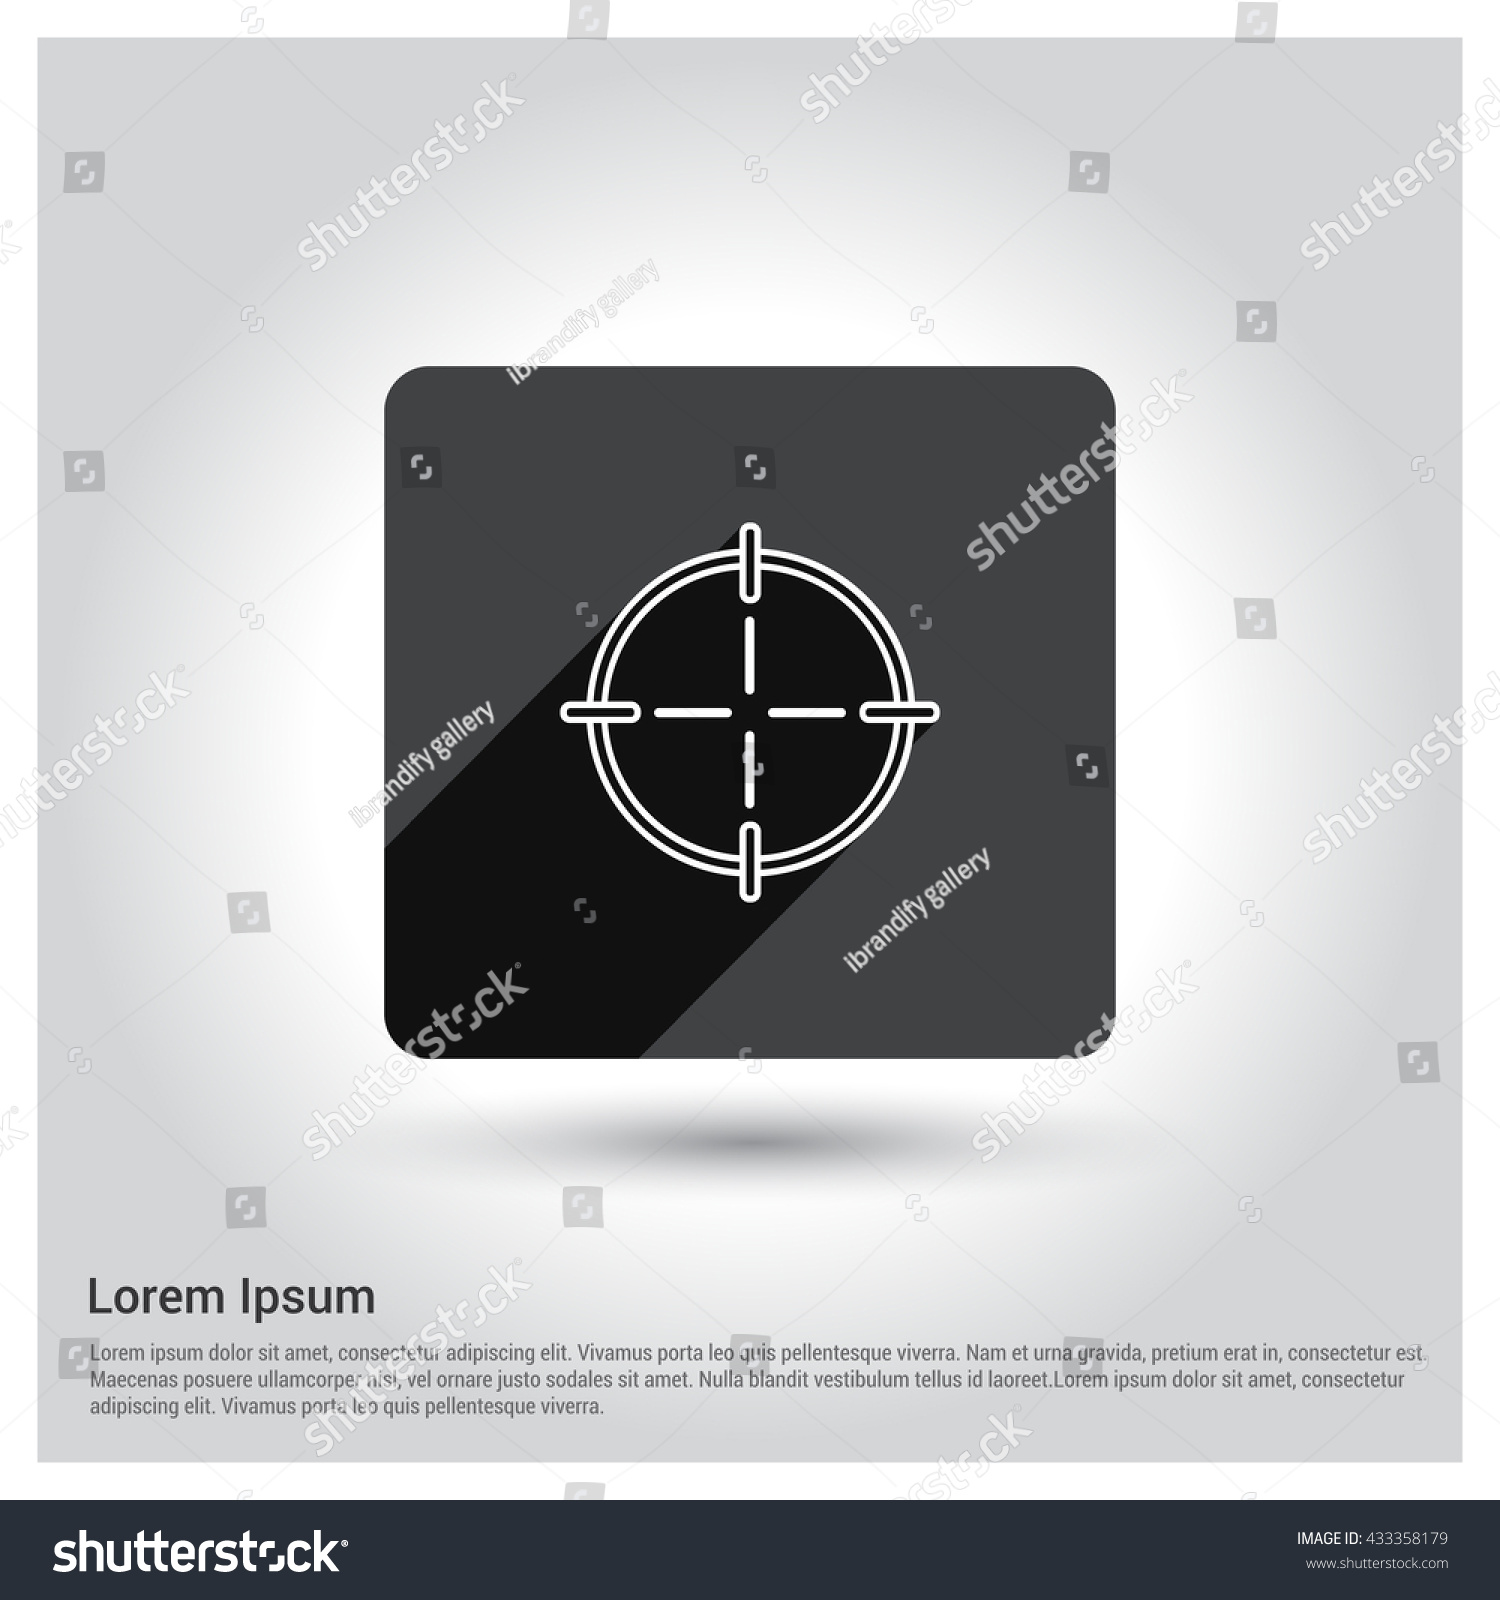 Aisl Shooting shooting target icon stock vector (royalty free) 433358179